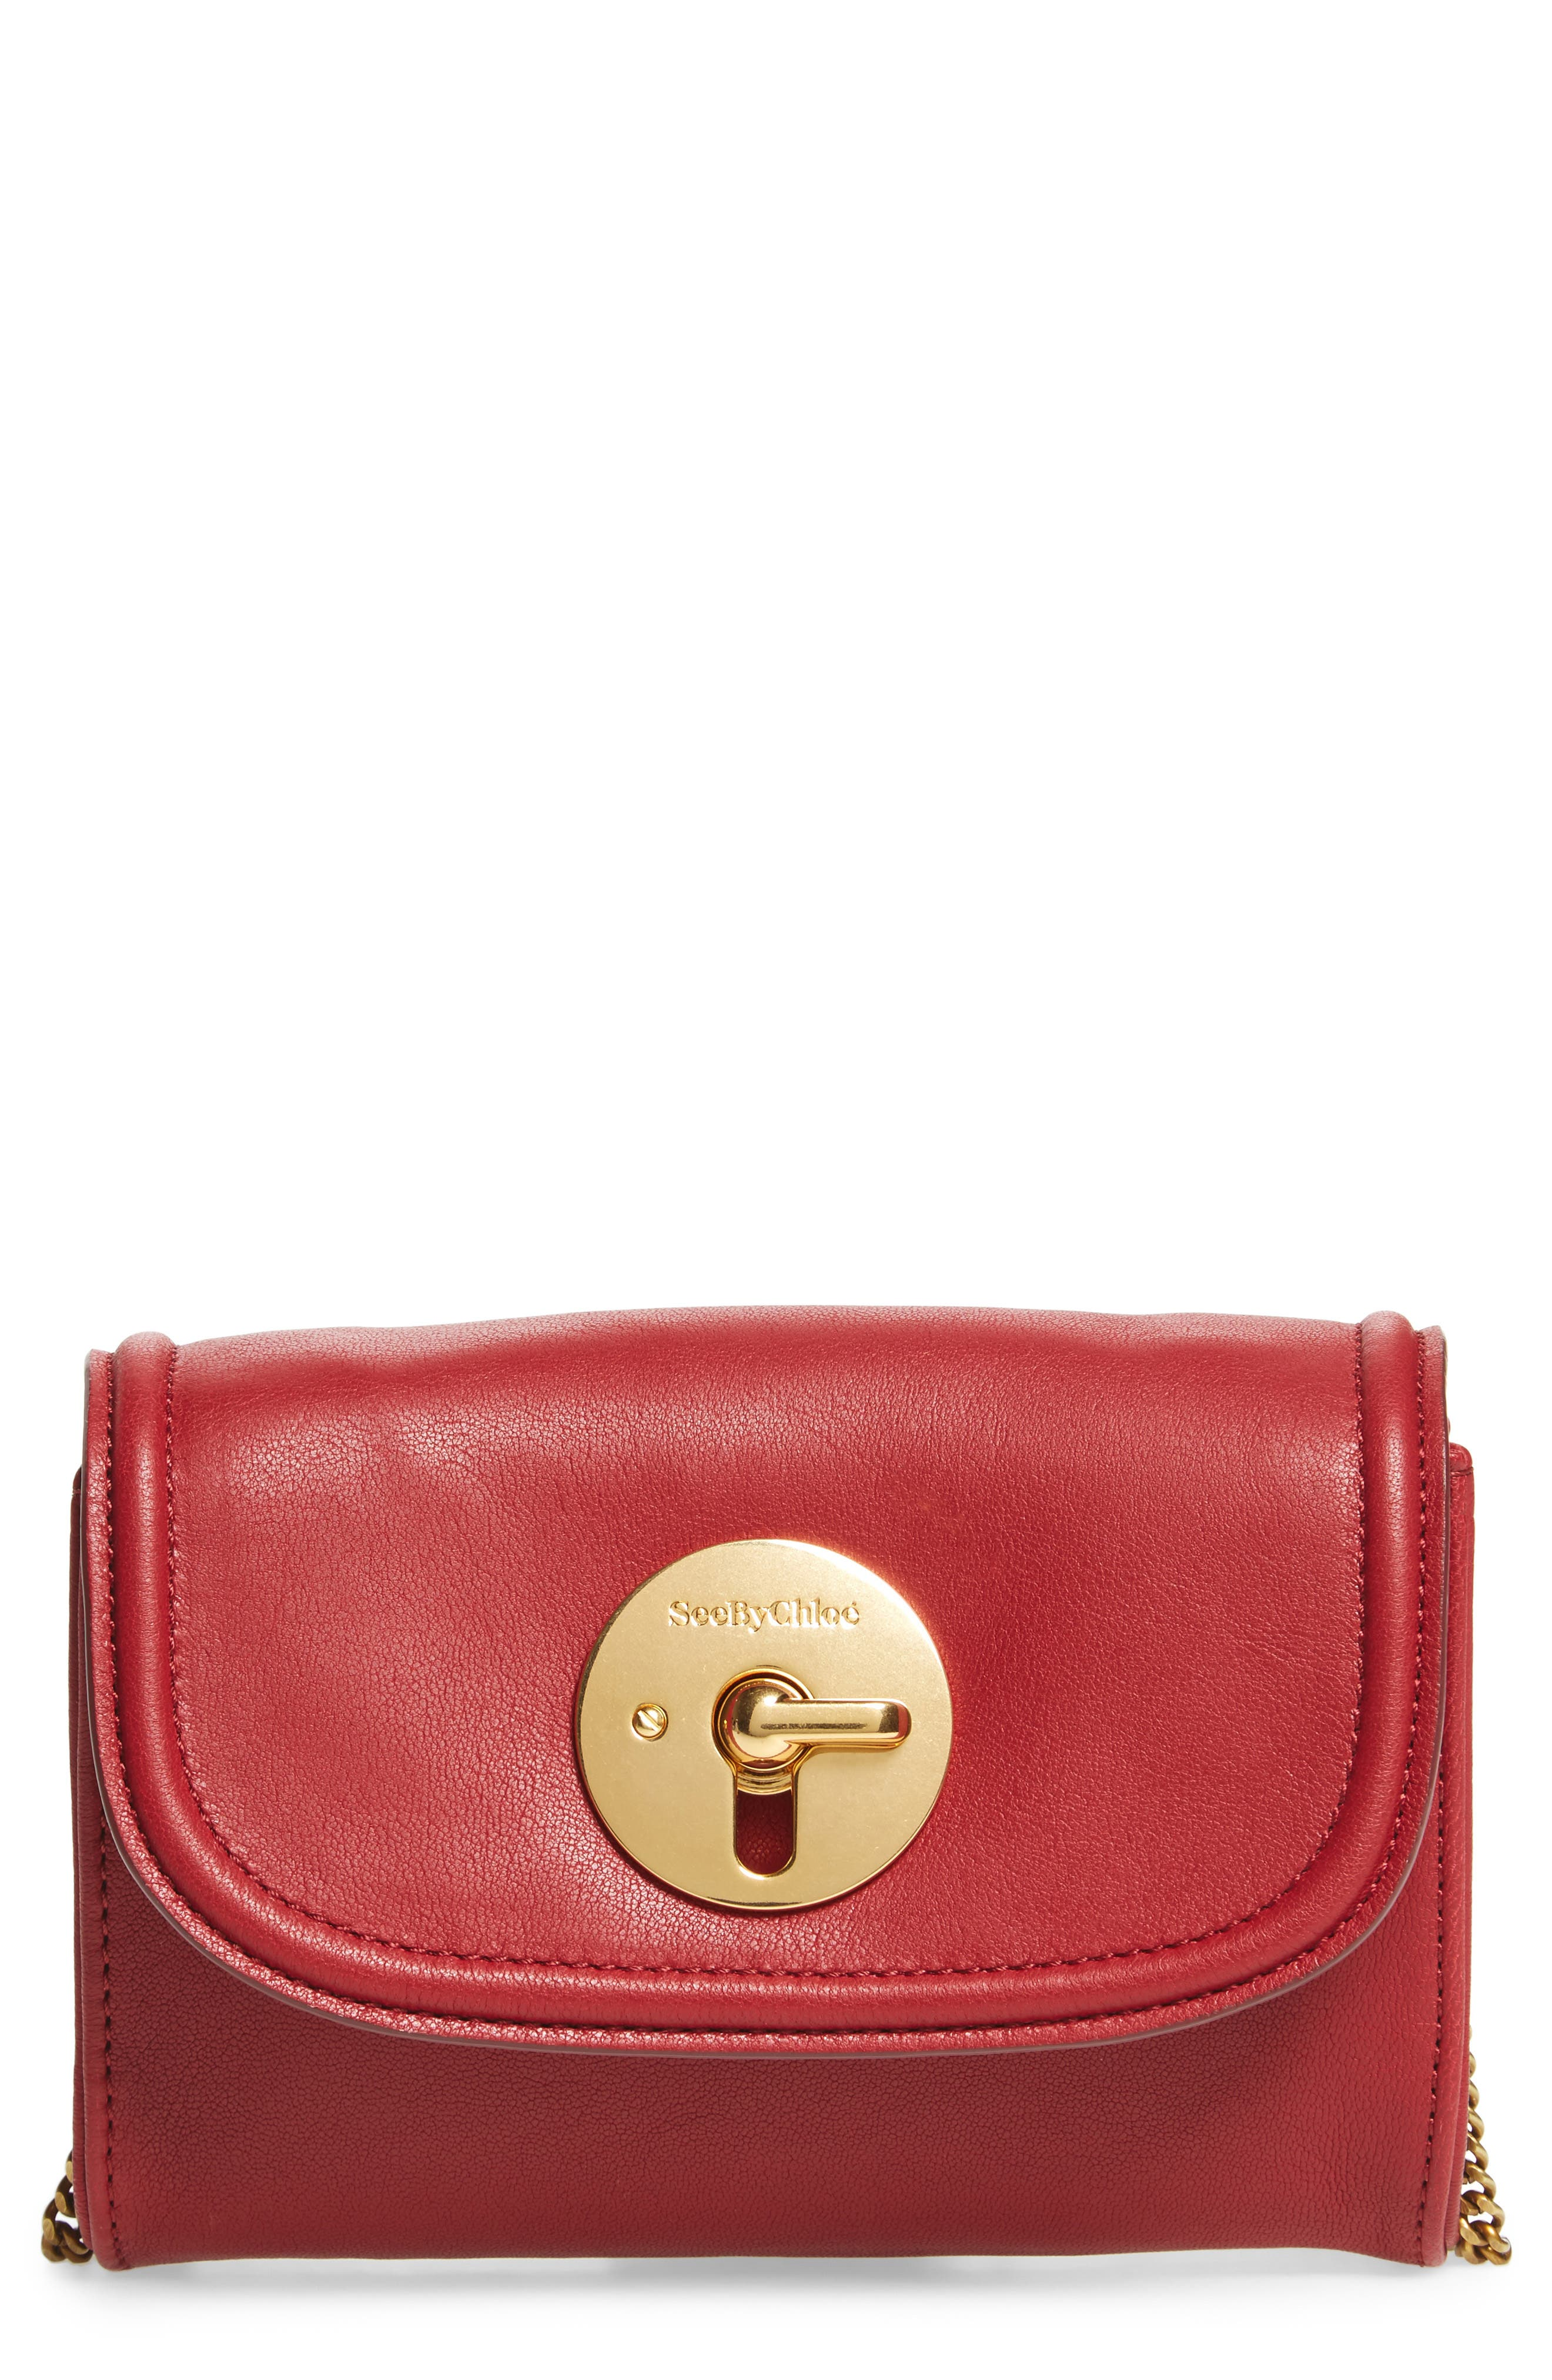 See by Chloé Mini Leather Crossbody Bag